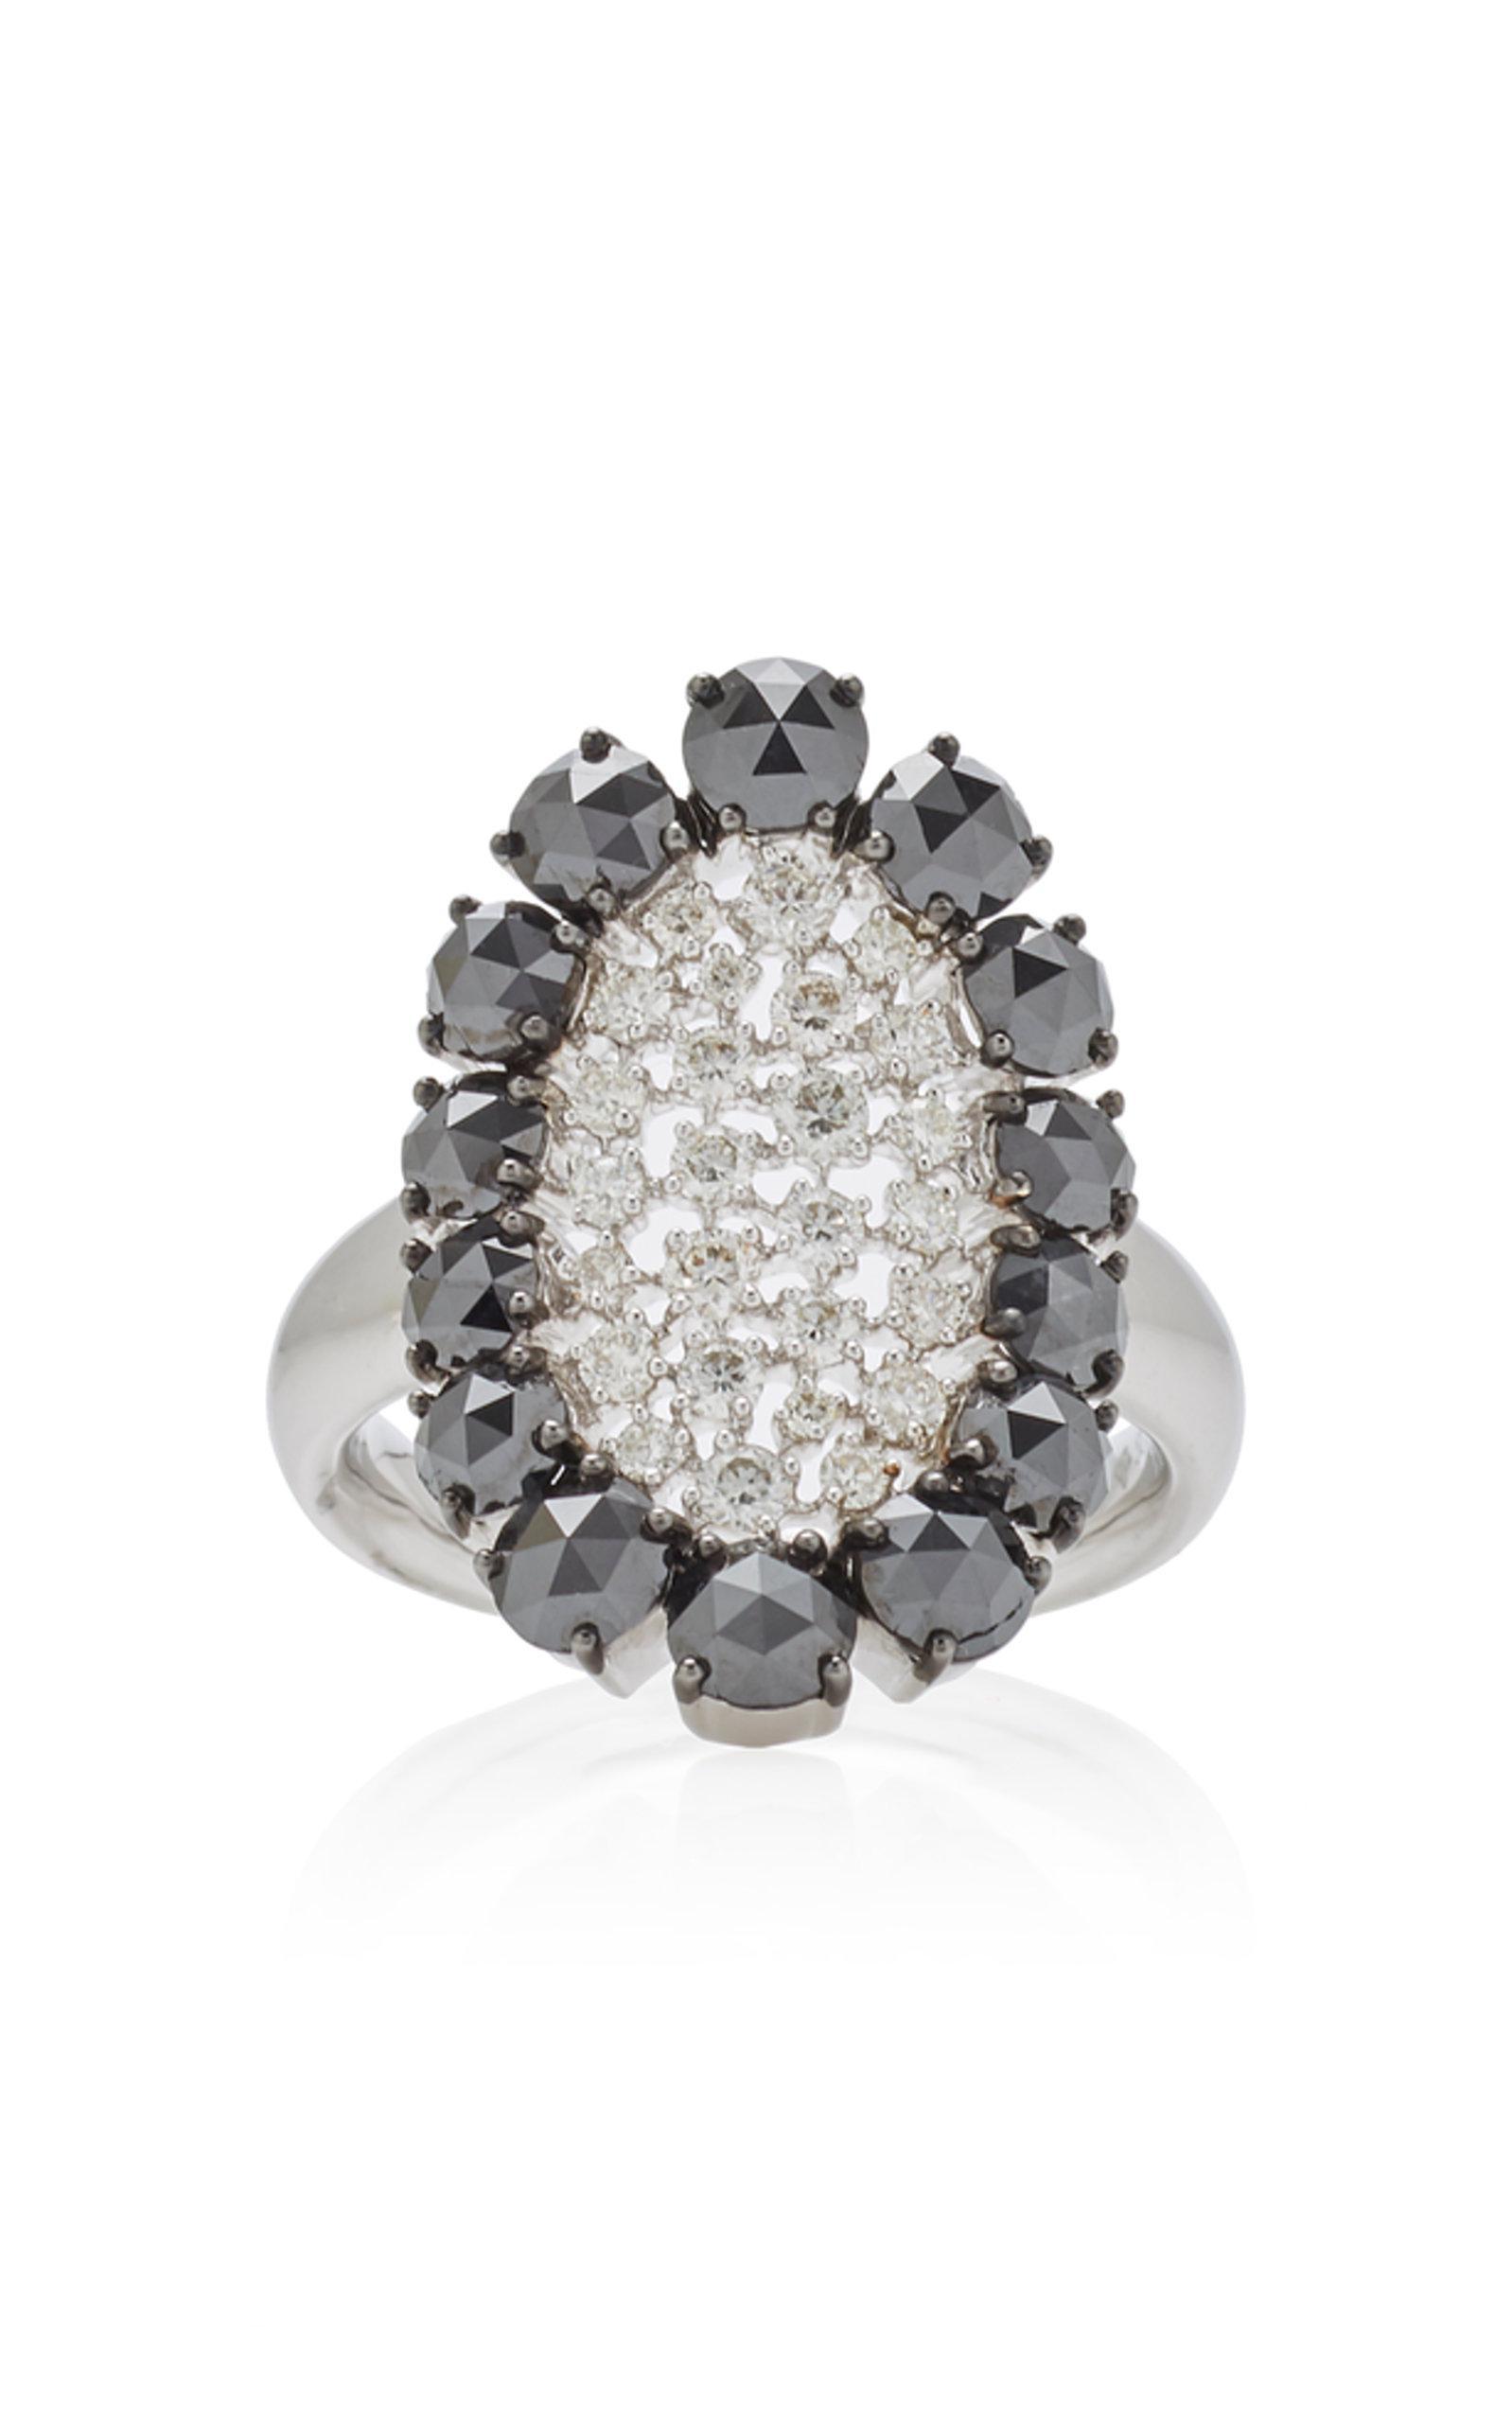 Scintilliae Black And White Diamond Ring Sutra tScDhVT